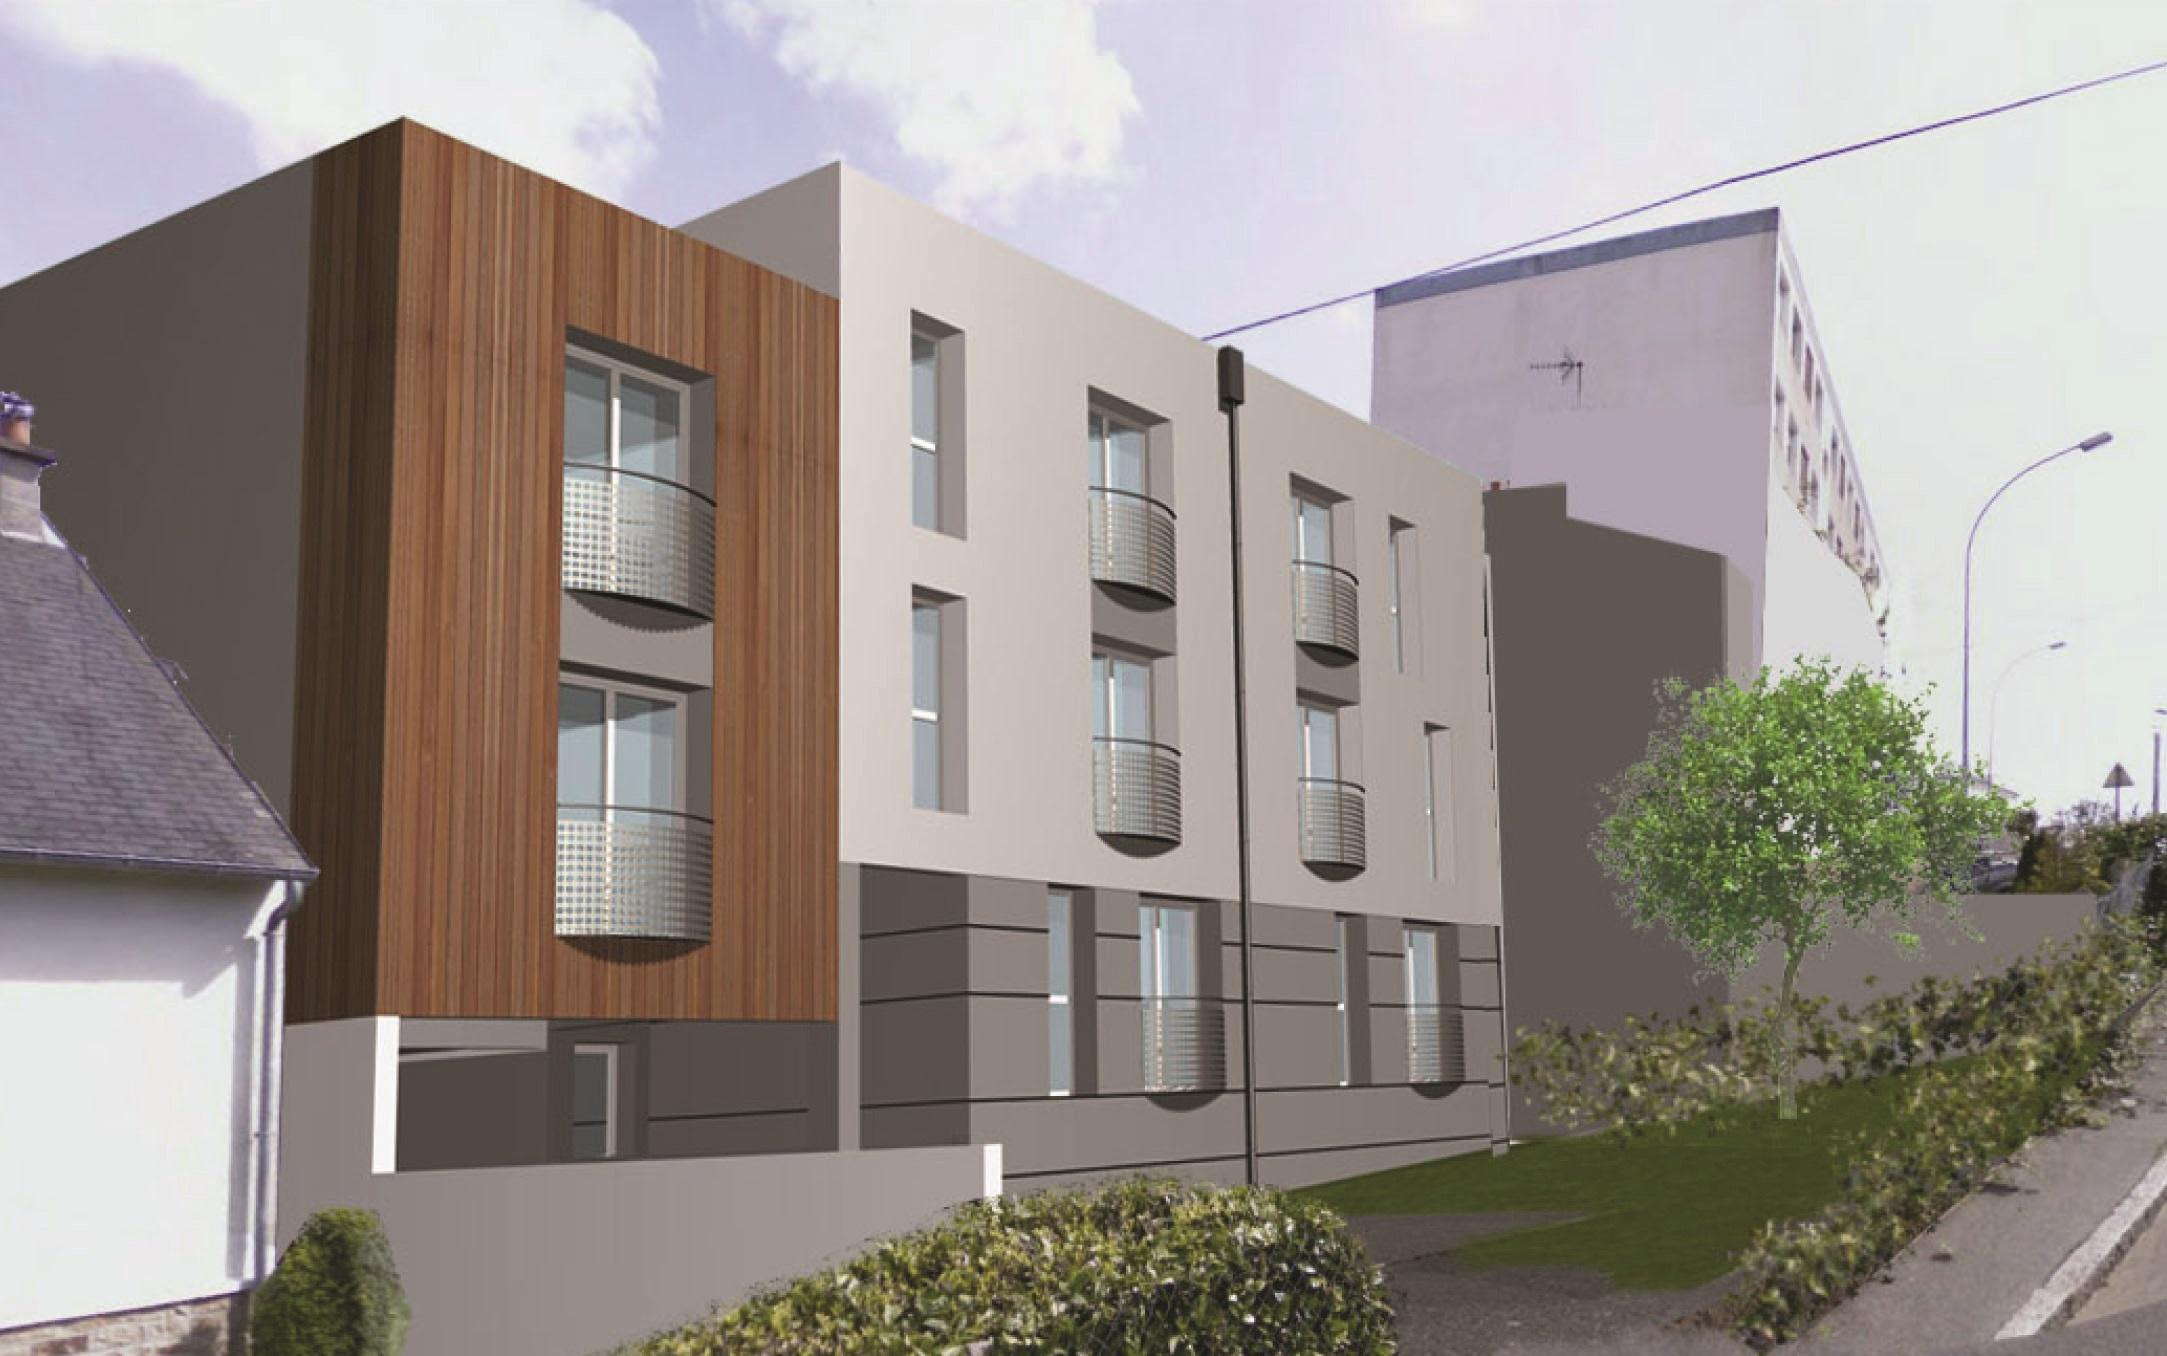 Brest appartements neufs eligibles pinel partir de for Agence immobiliere appartement neuf